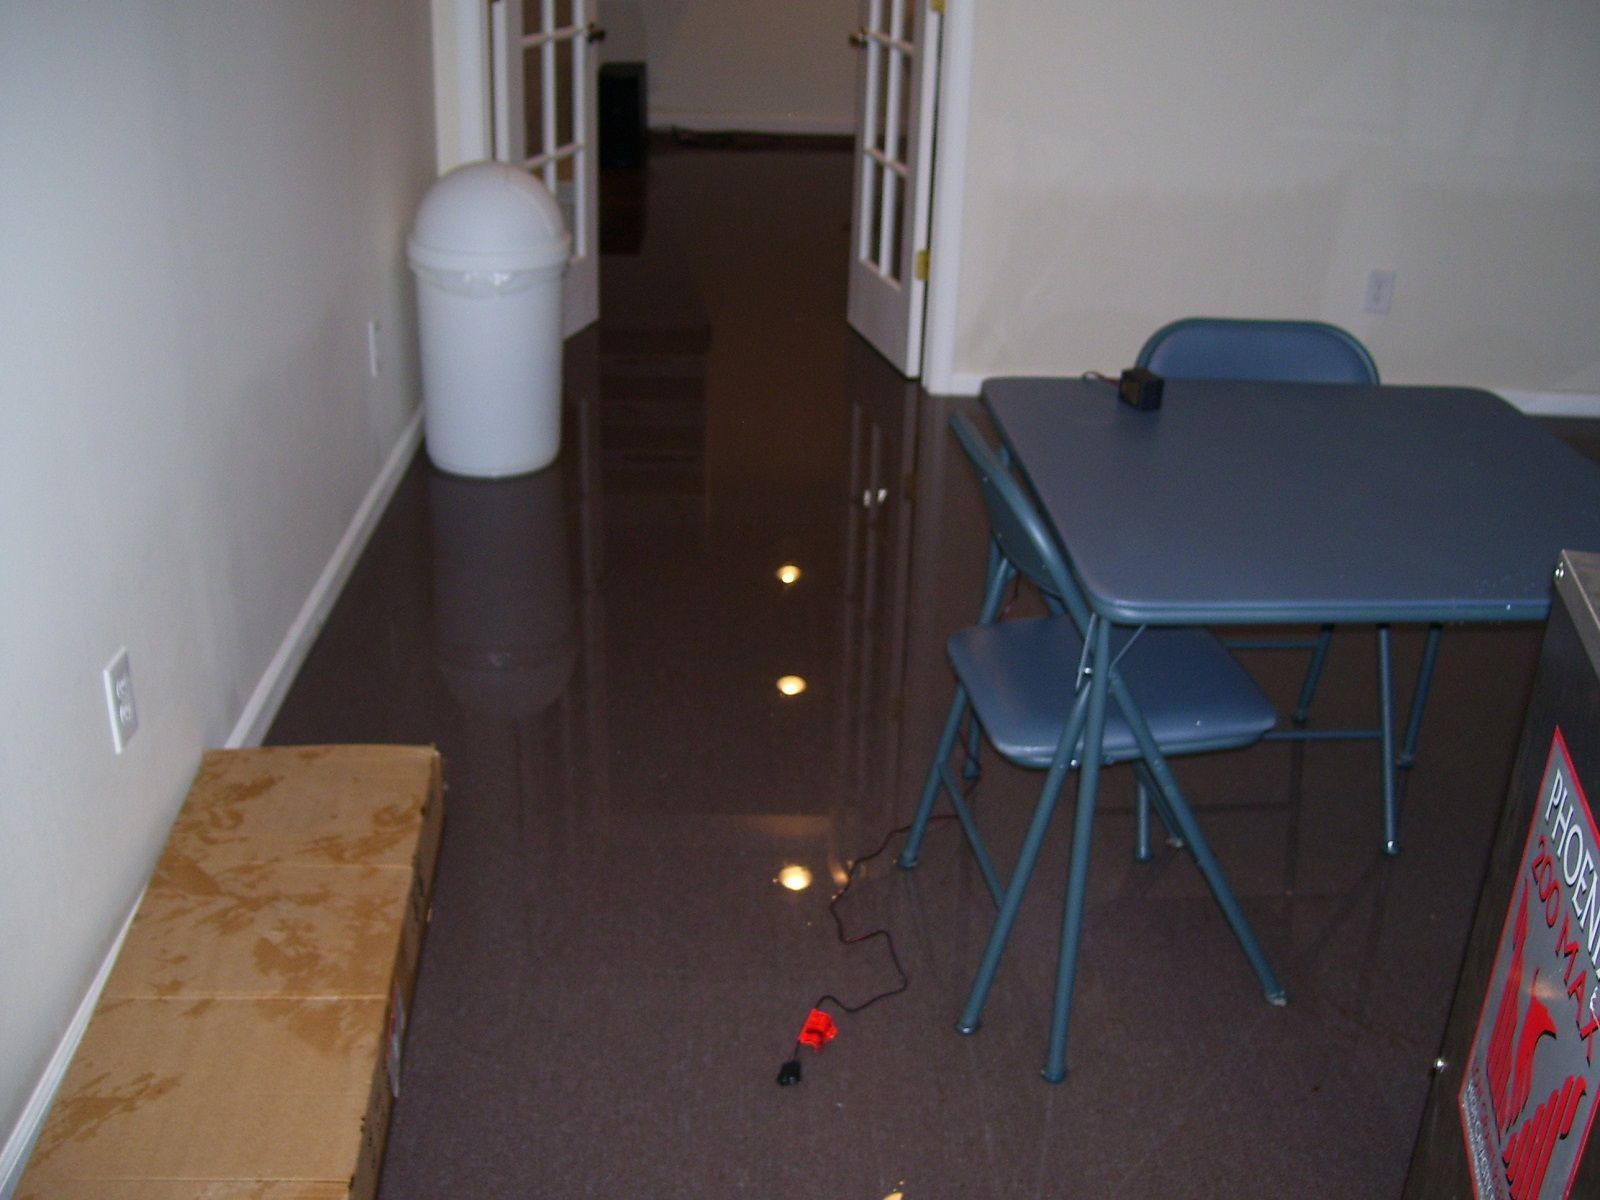 Basement great basement flooding through floor with